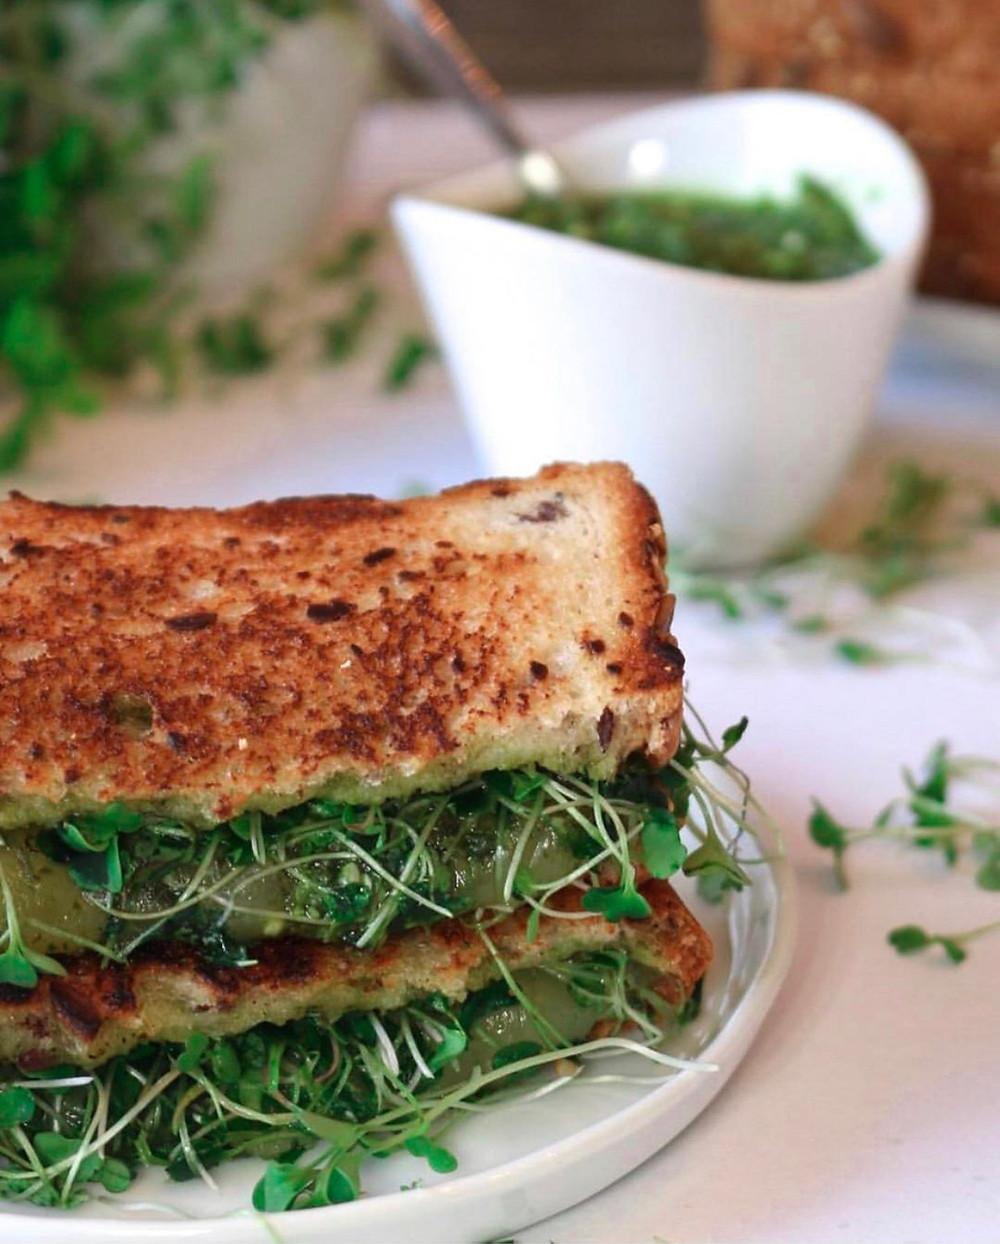 Gluten-free Little Northern Bakehouse Grilled Cheese Sandwich